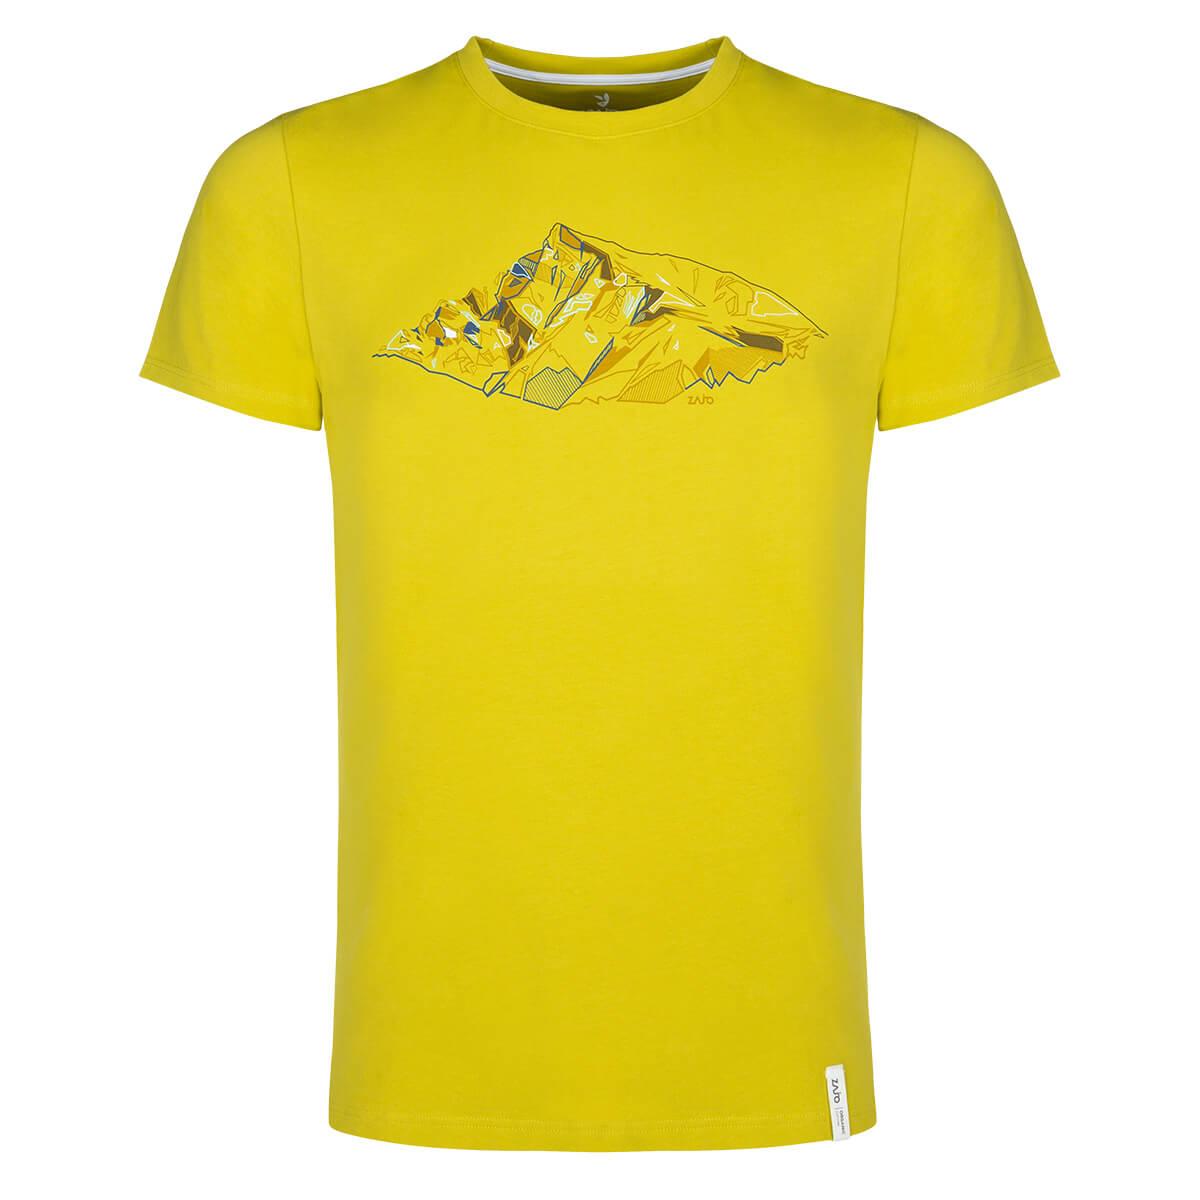 ZAJO Bormio T-Shirt SS pánske tričko Citronelle Peak - veľkosť S